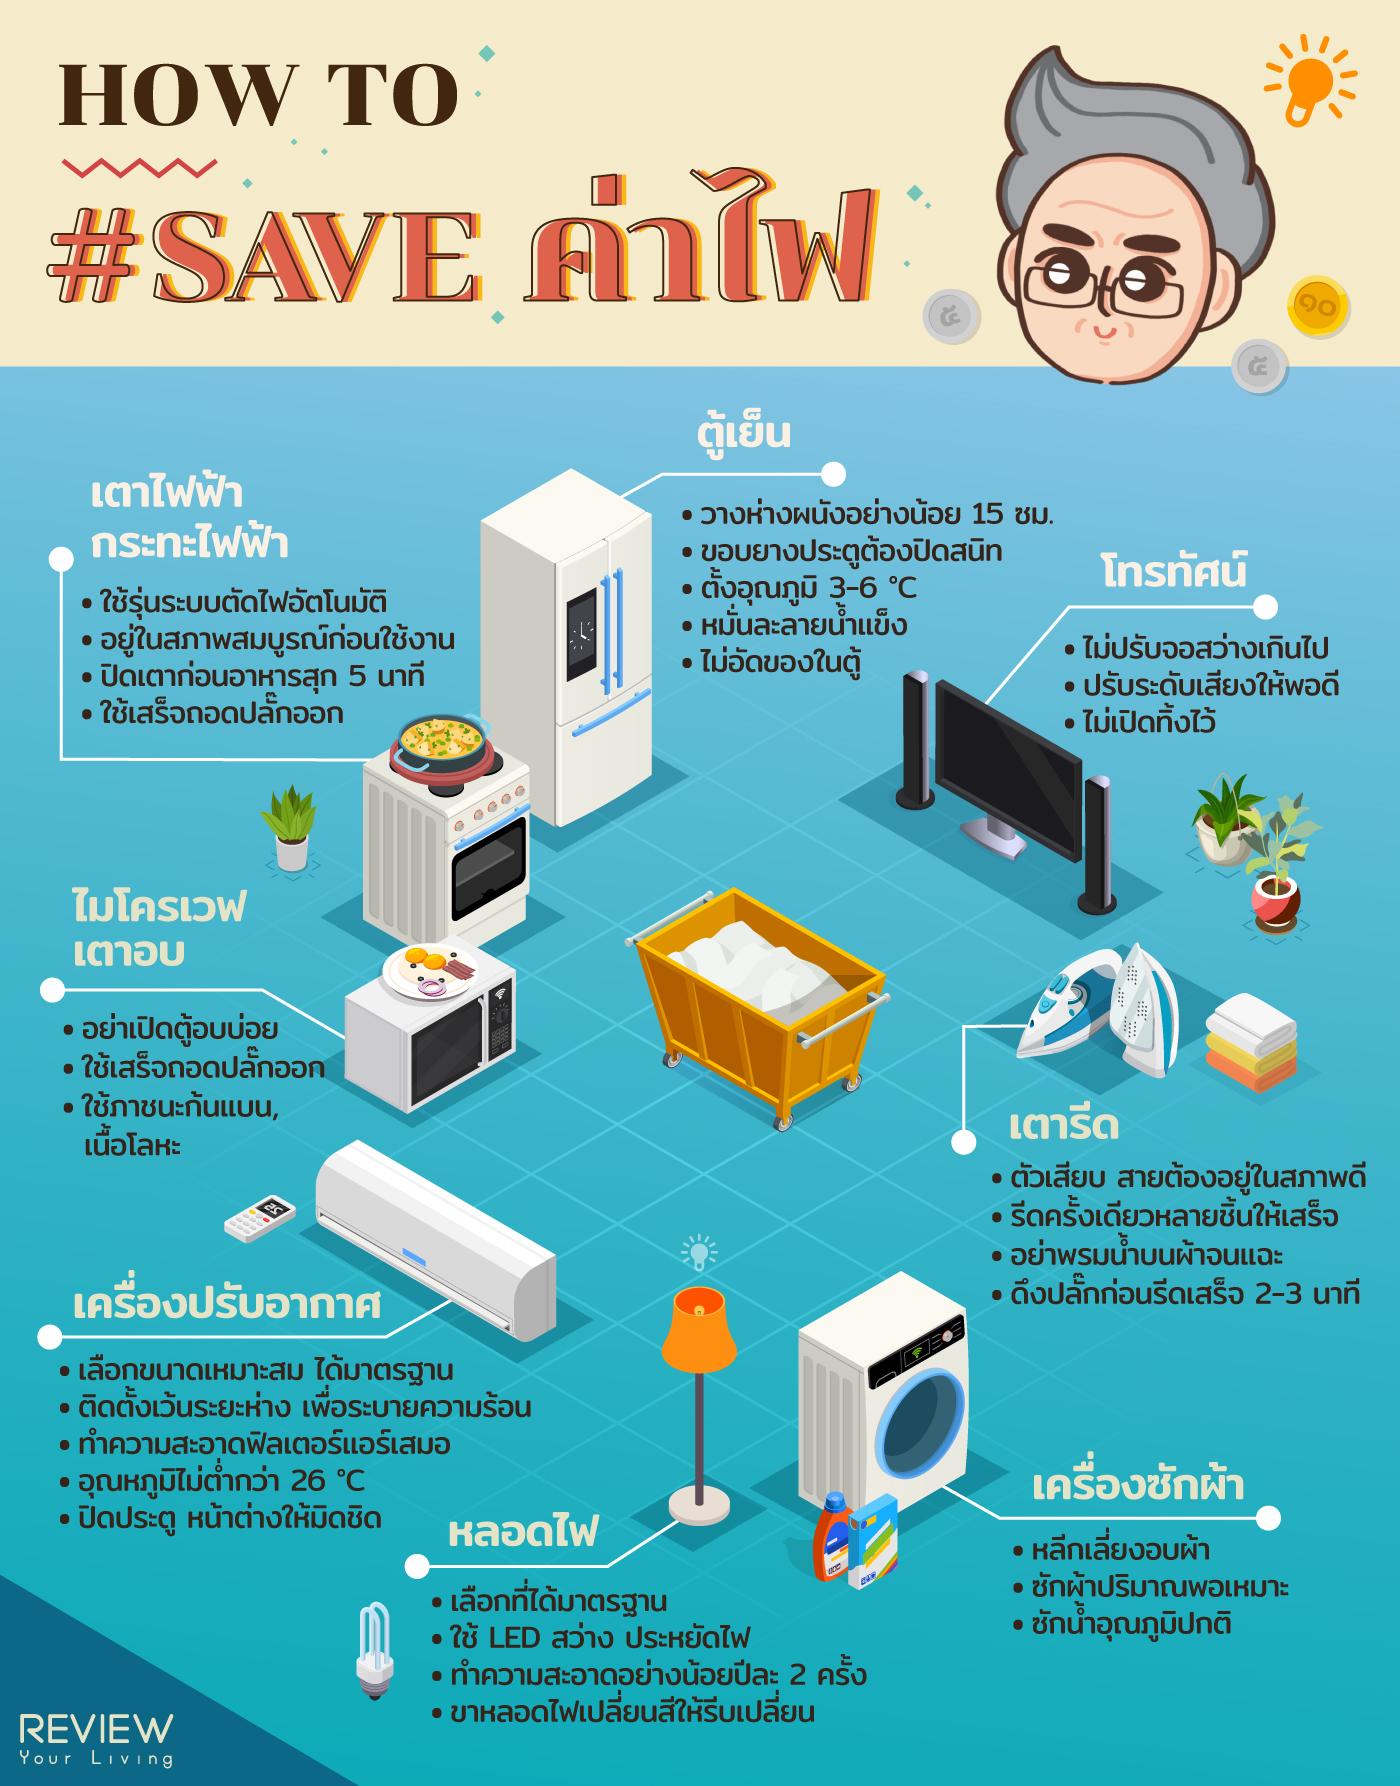 Save Bill